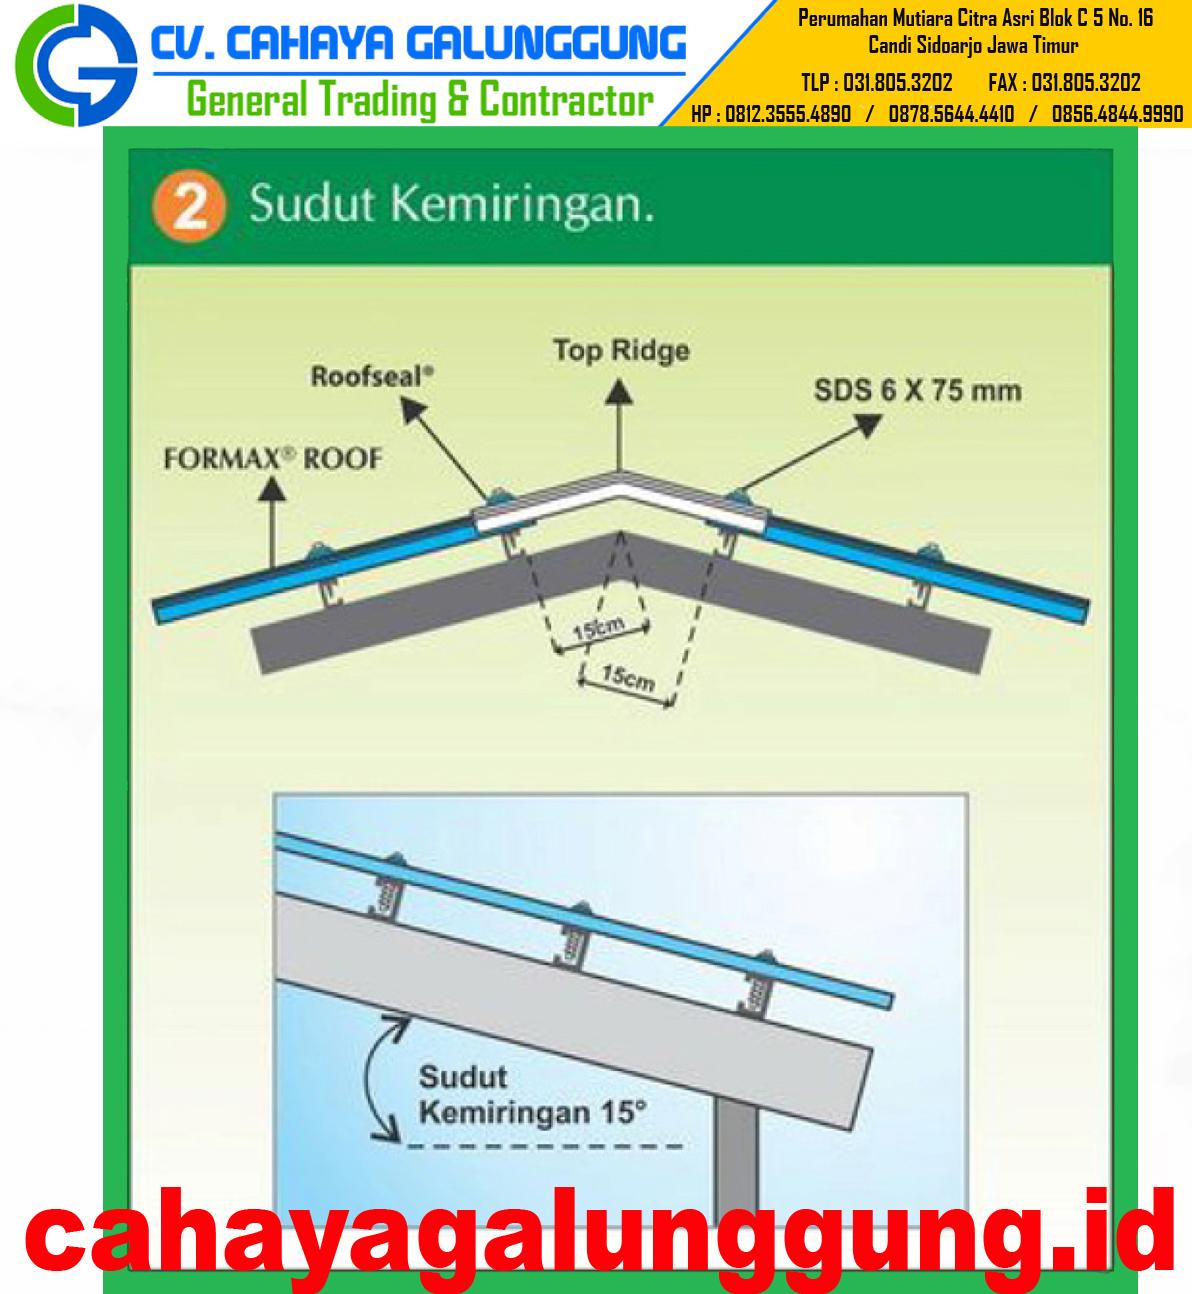 Harga Atap Upvc Formax Roof Terbaru 2018 - CV CAHAYA ...